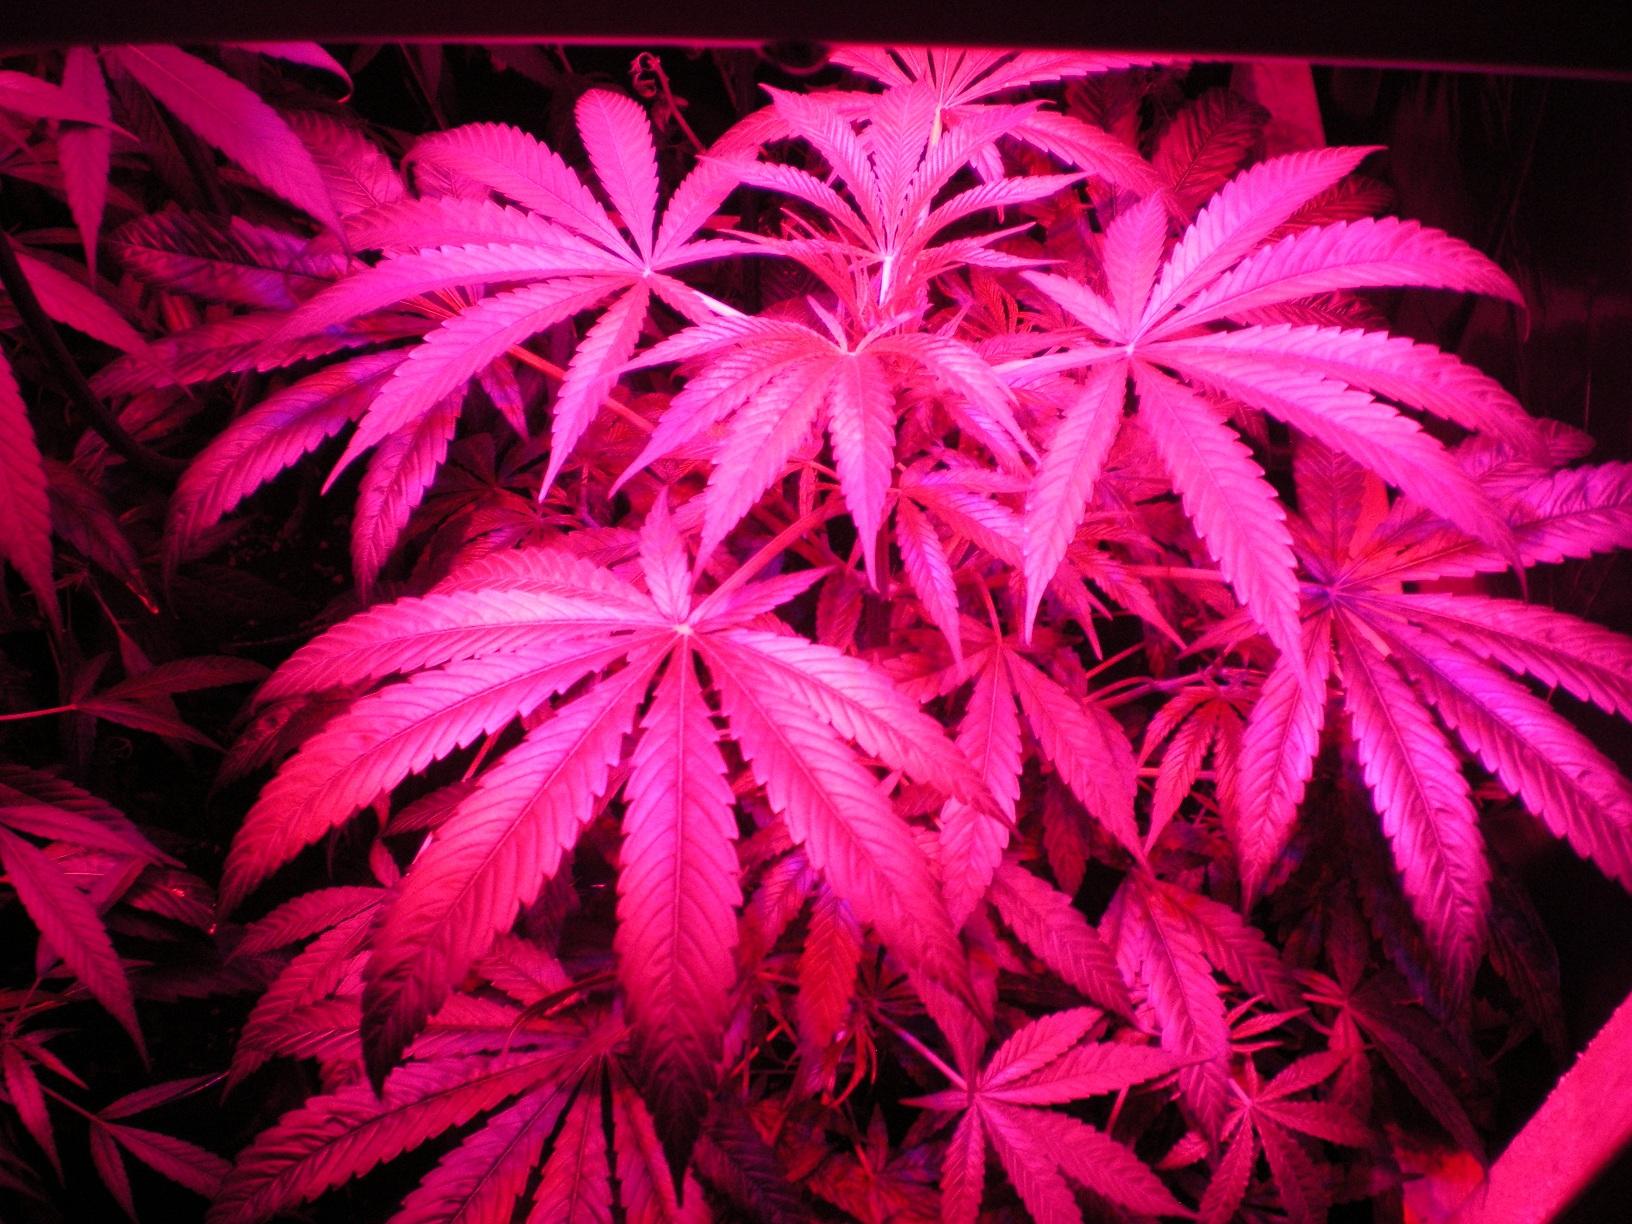 A Description of the History Purposes of Marijuana